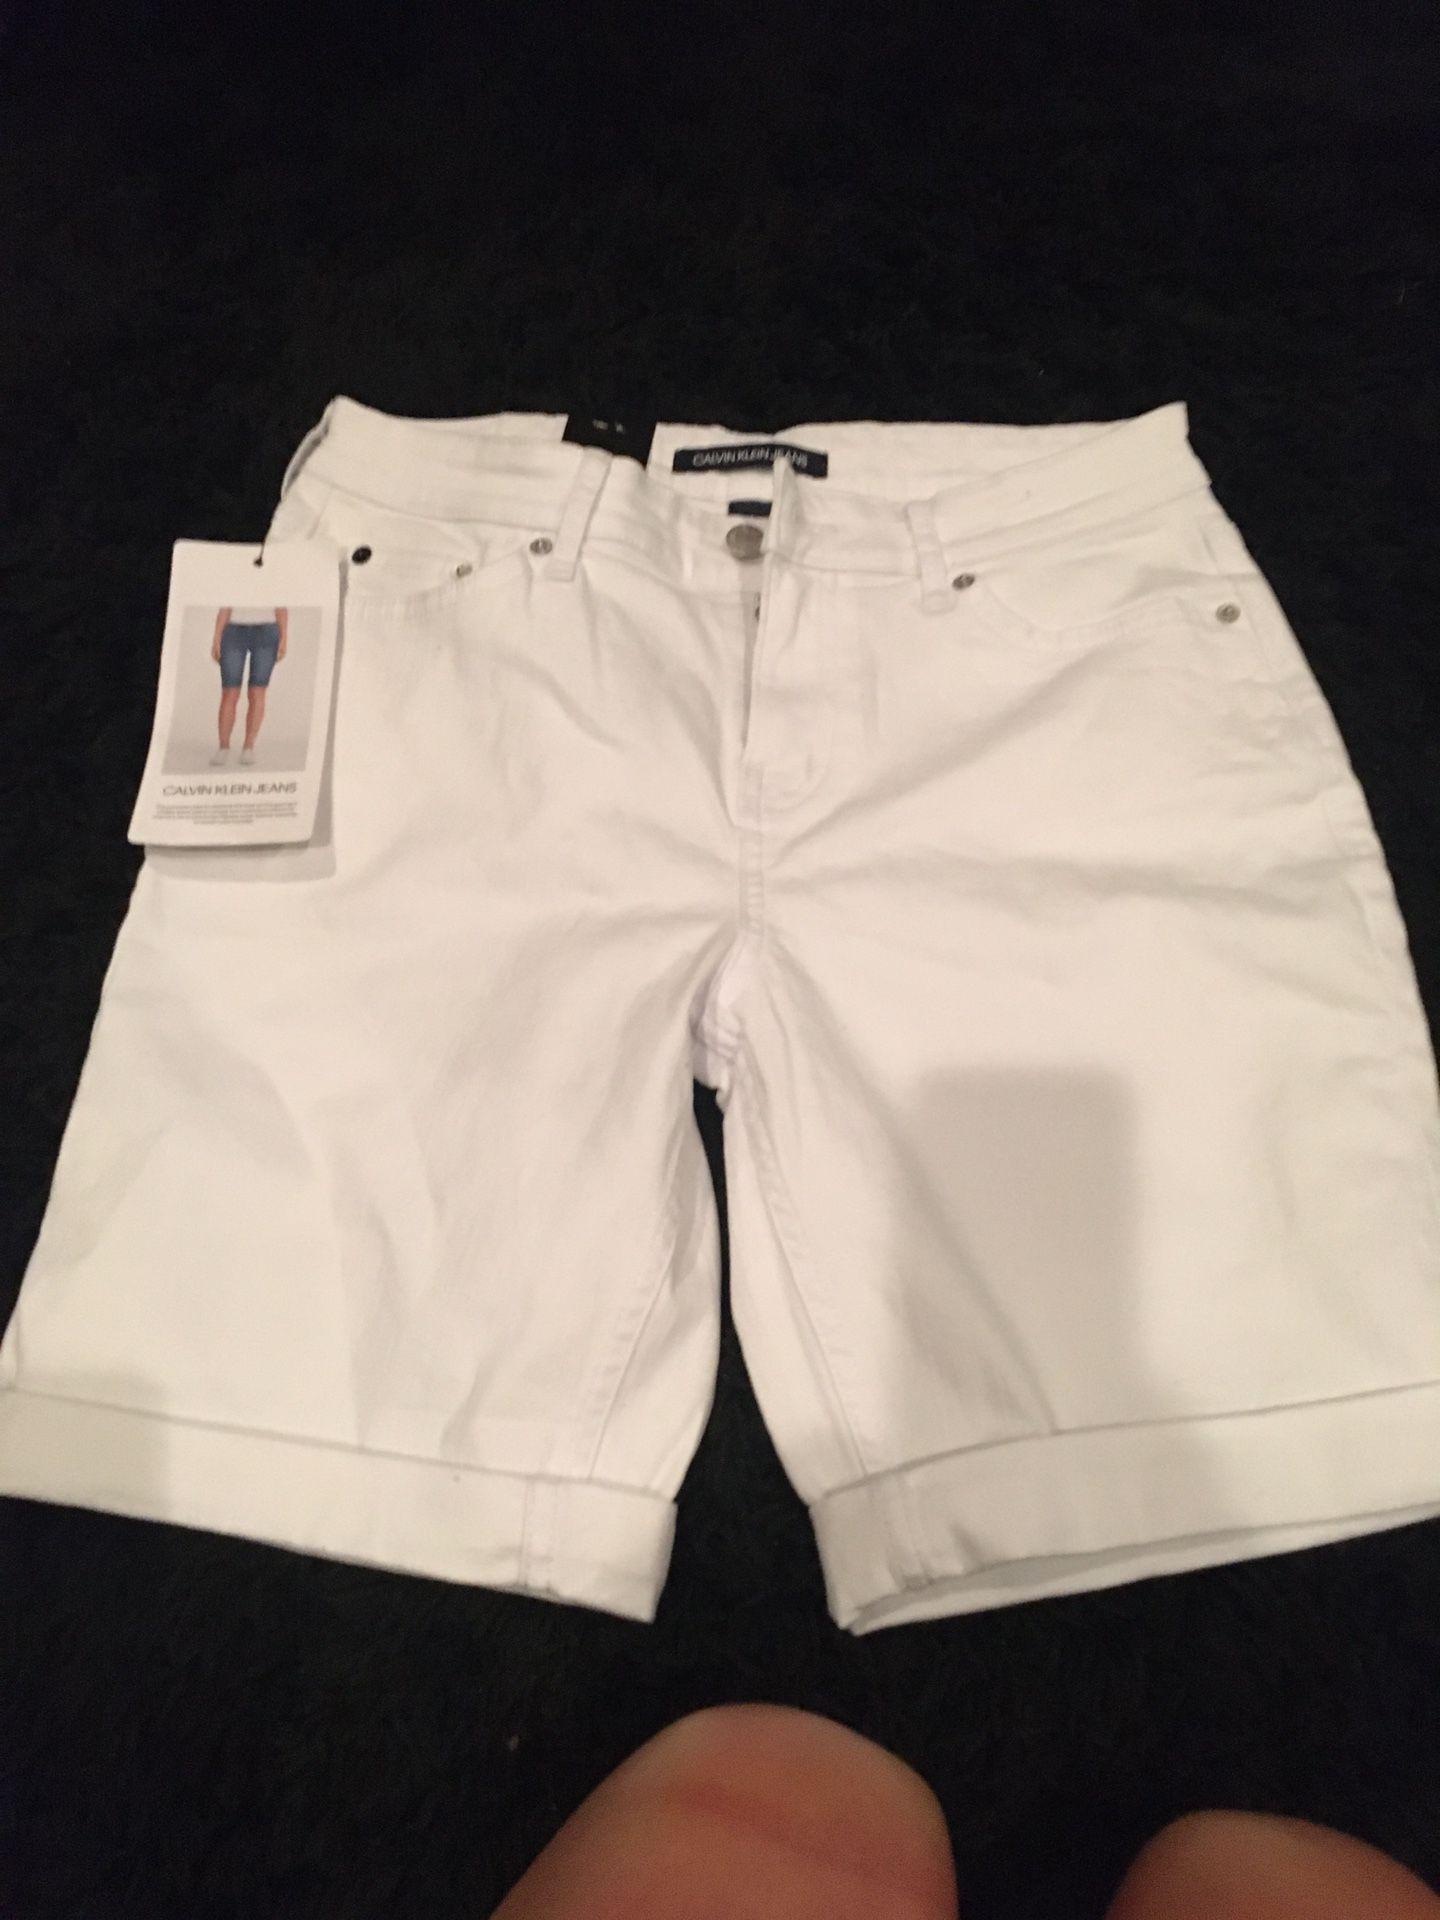 Calvin Klein Jean shorts brand new size 8